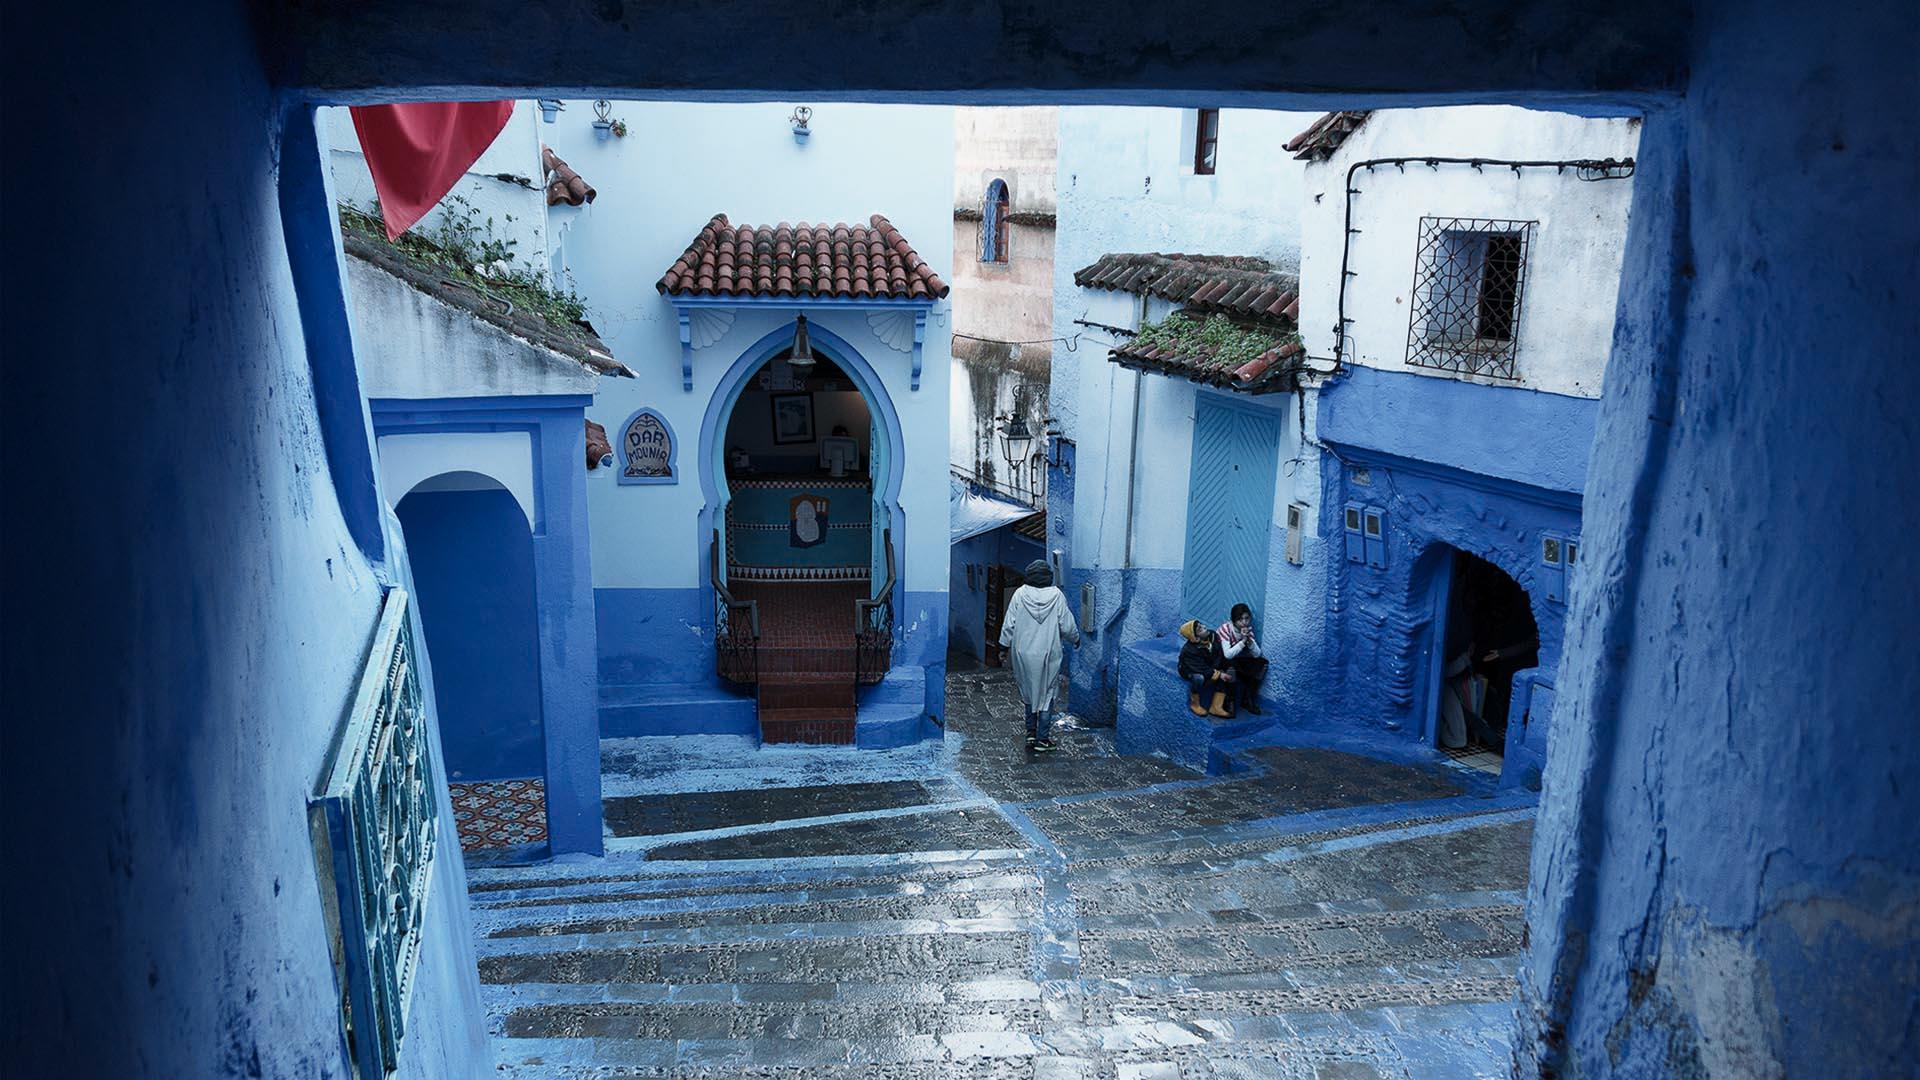 Berauschend vielseitig - Ouarzazate - Bourmaine Dades Dades Todra